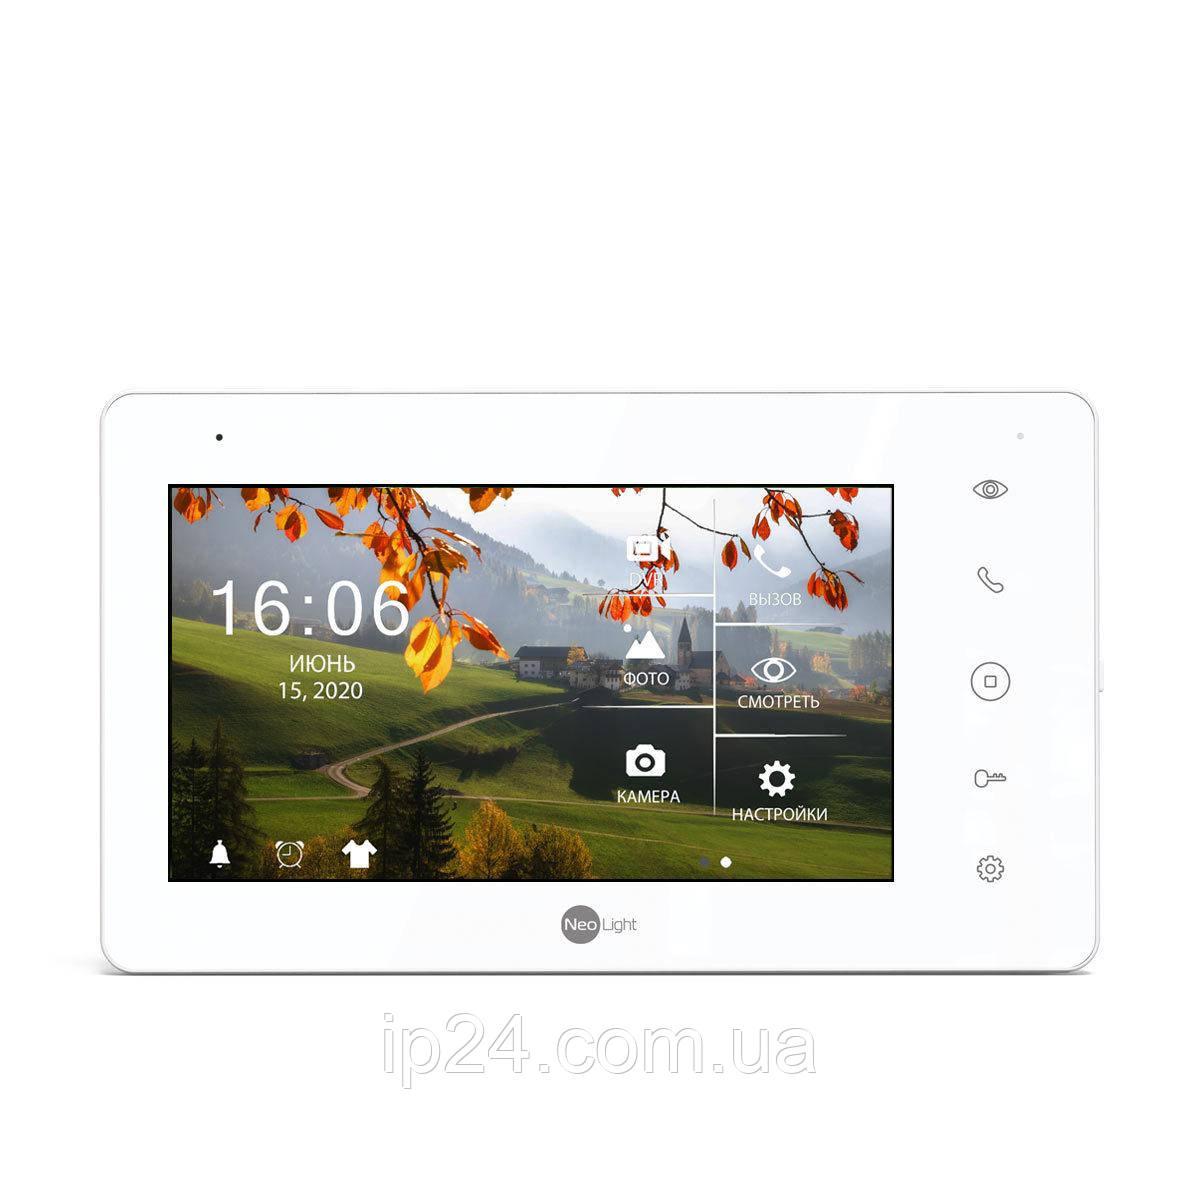 Домофон NeoLight Sigma+ HD IPS екраном